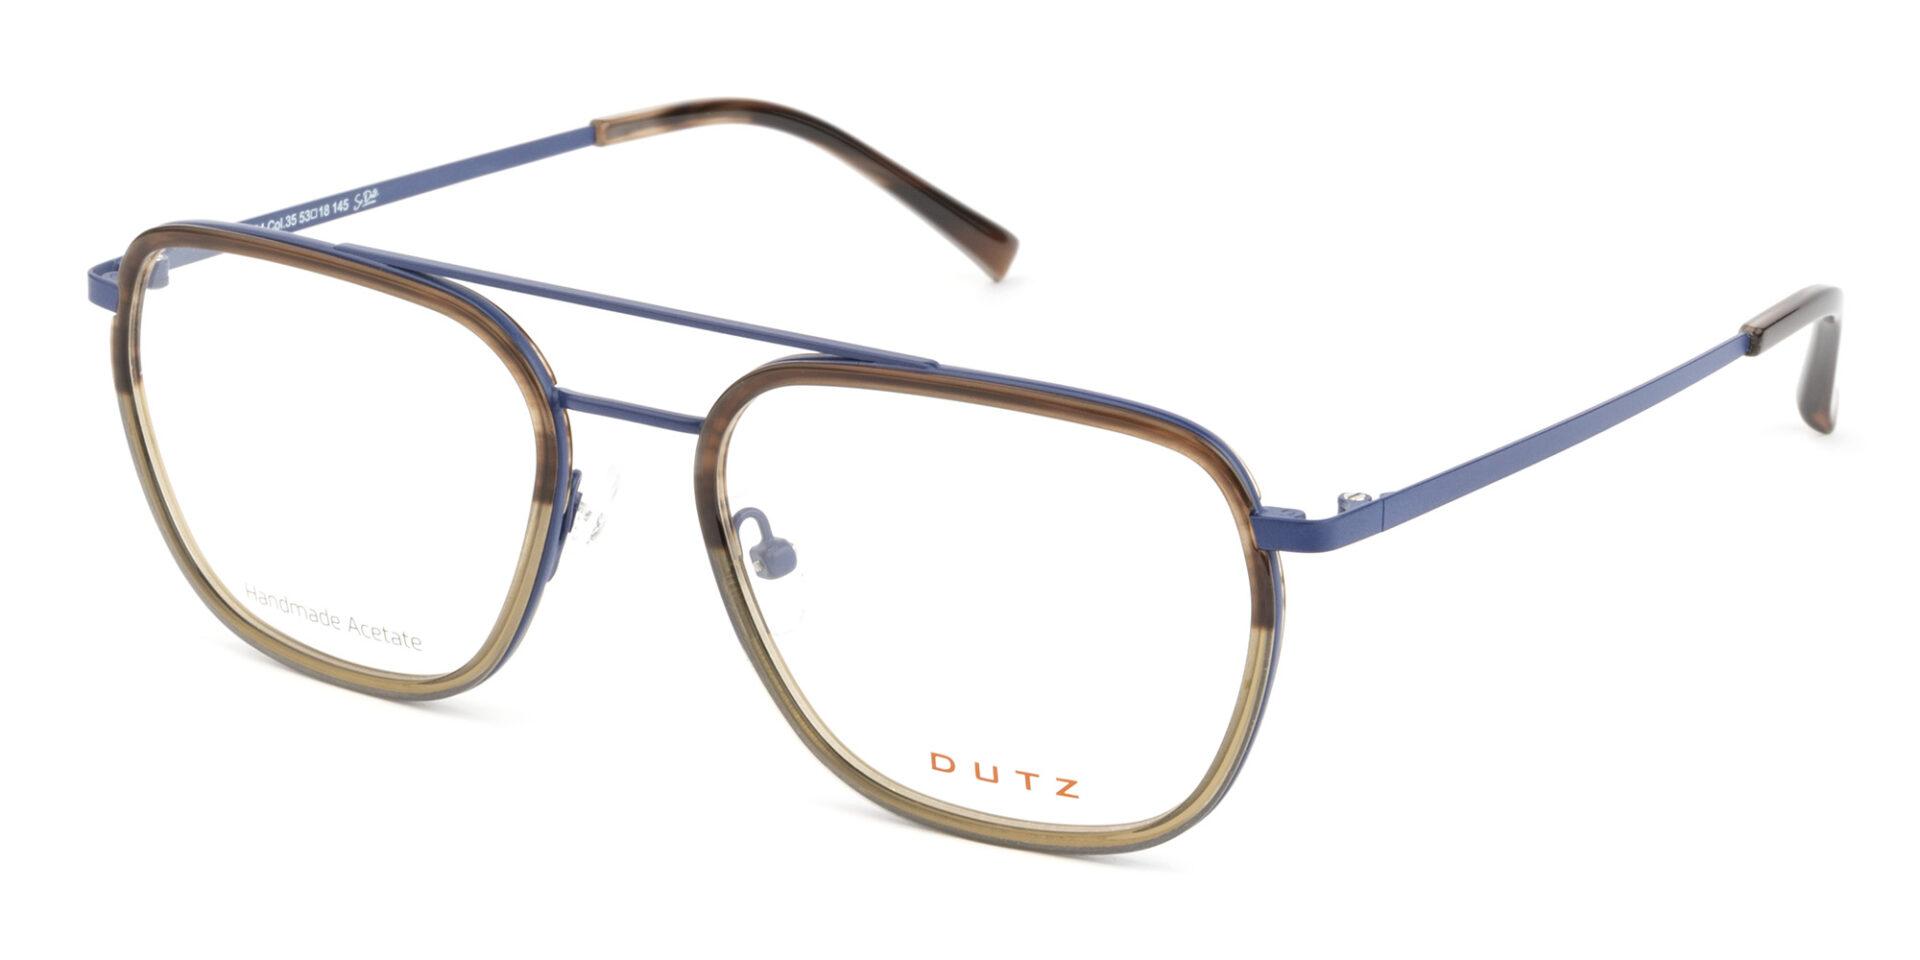 DZ2234-35